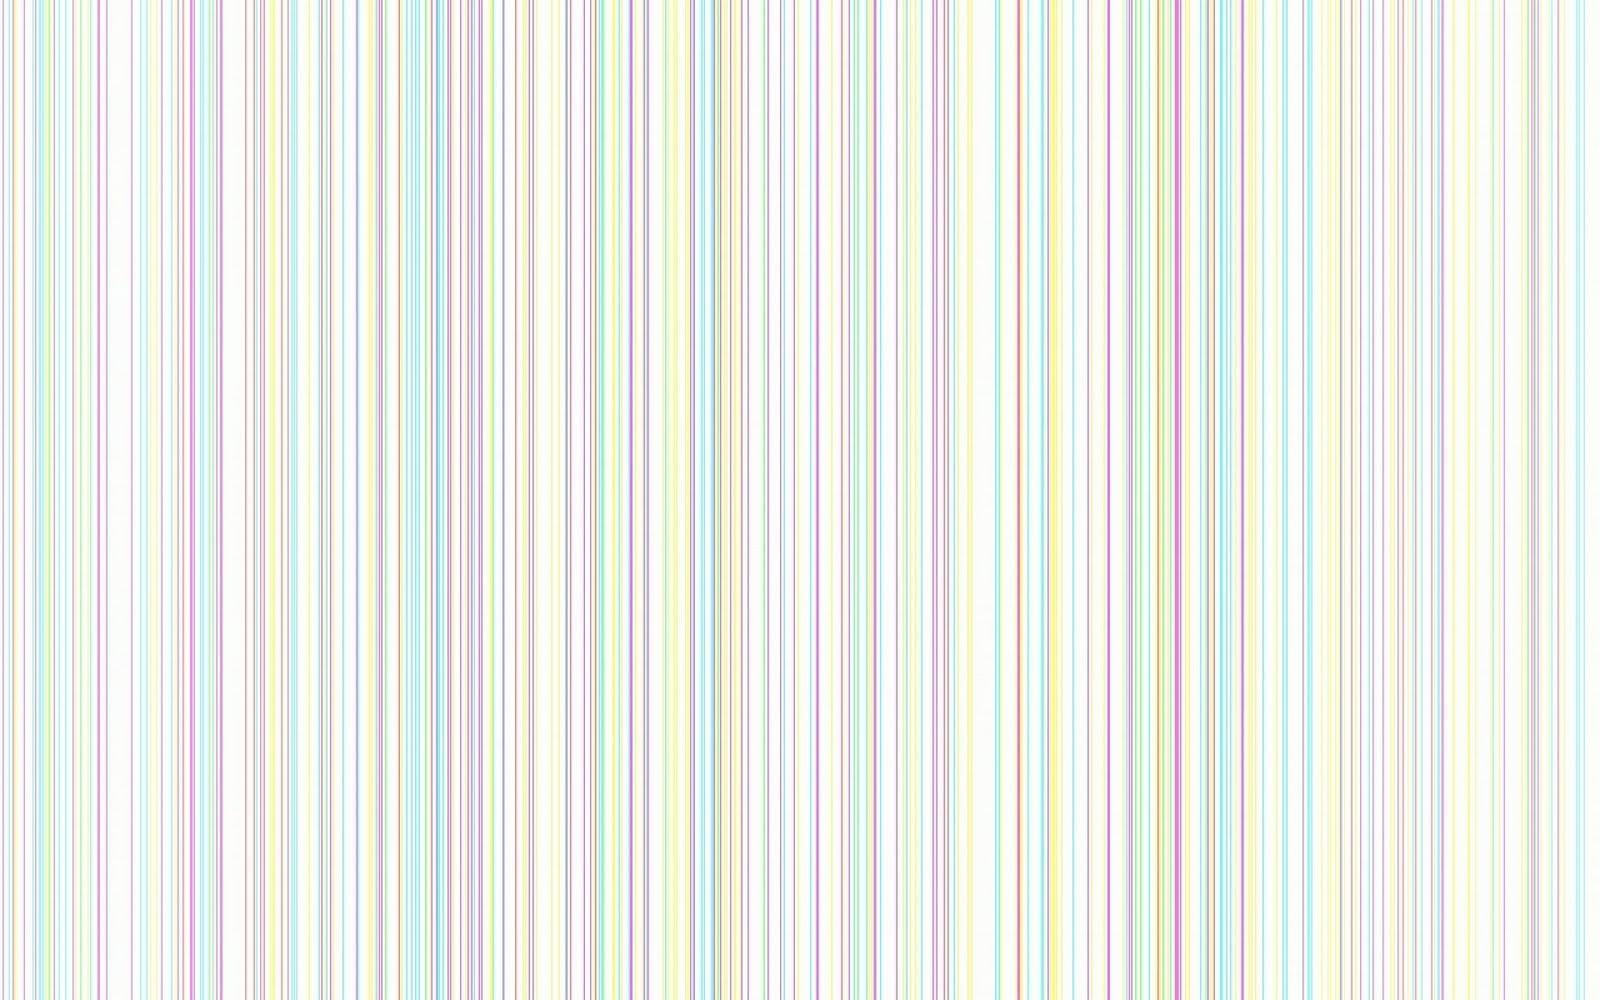 Yellow Stripe Wallpaper: Yellow And White Striped Wallpaper